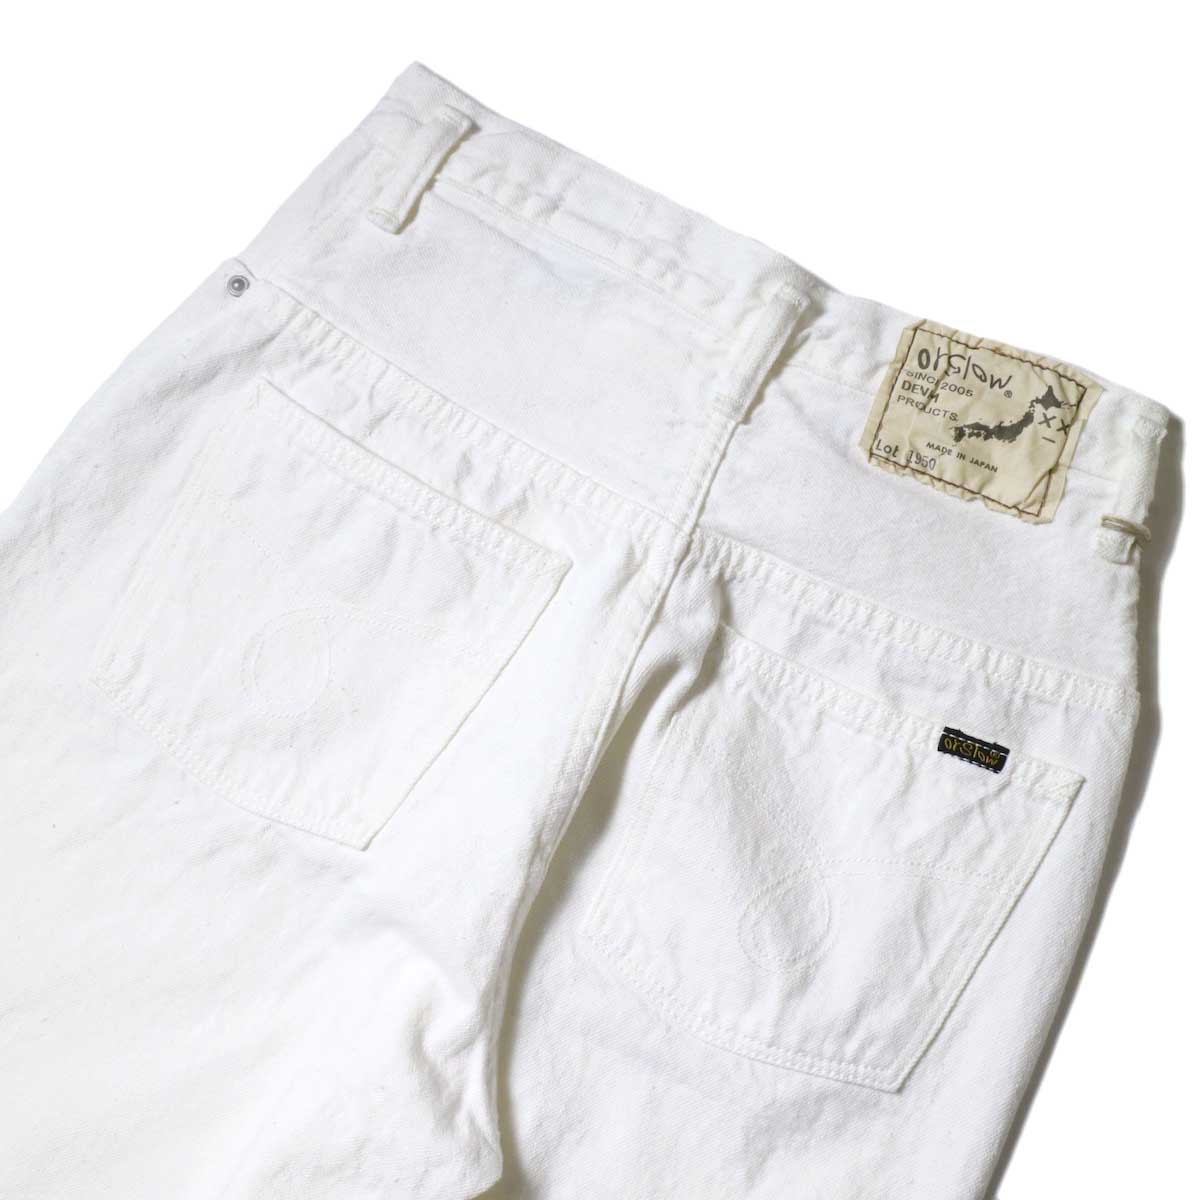 orSlow / High Waist Denim Pants (Jasmin) バックポケット